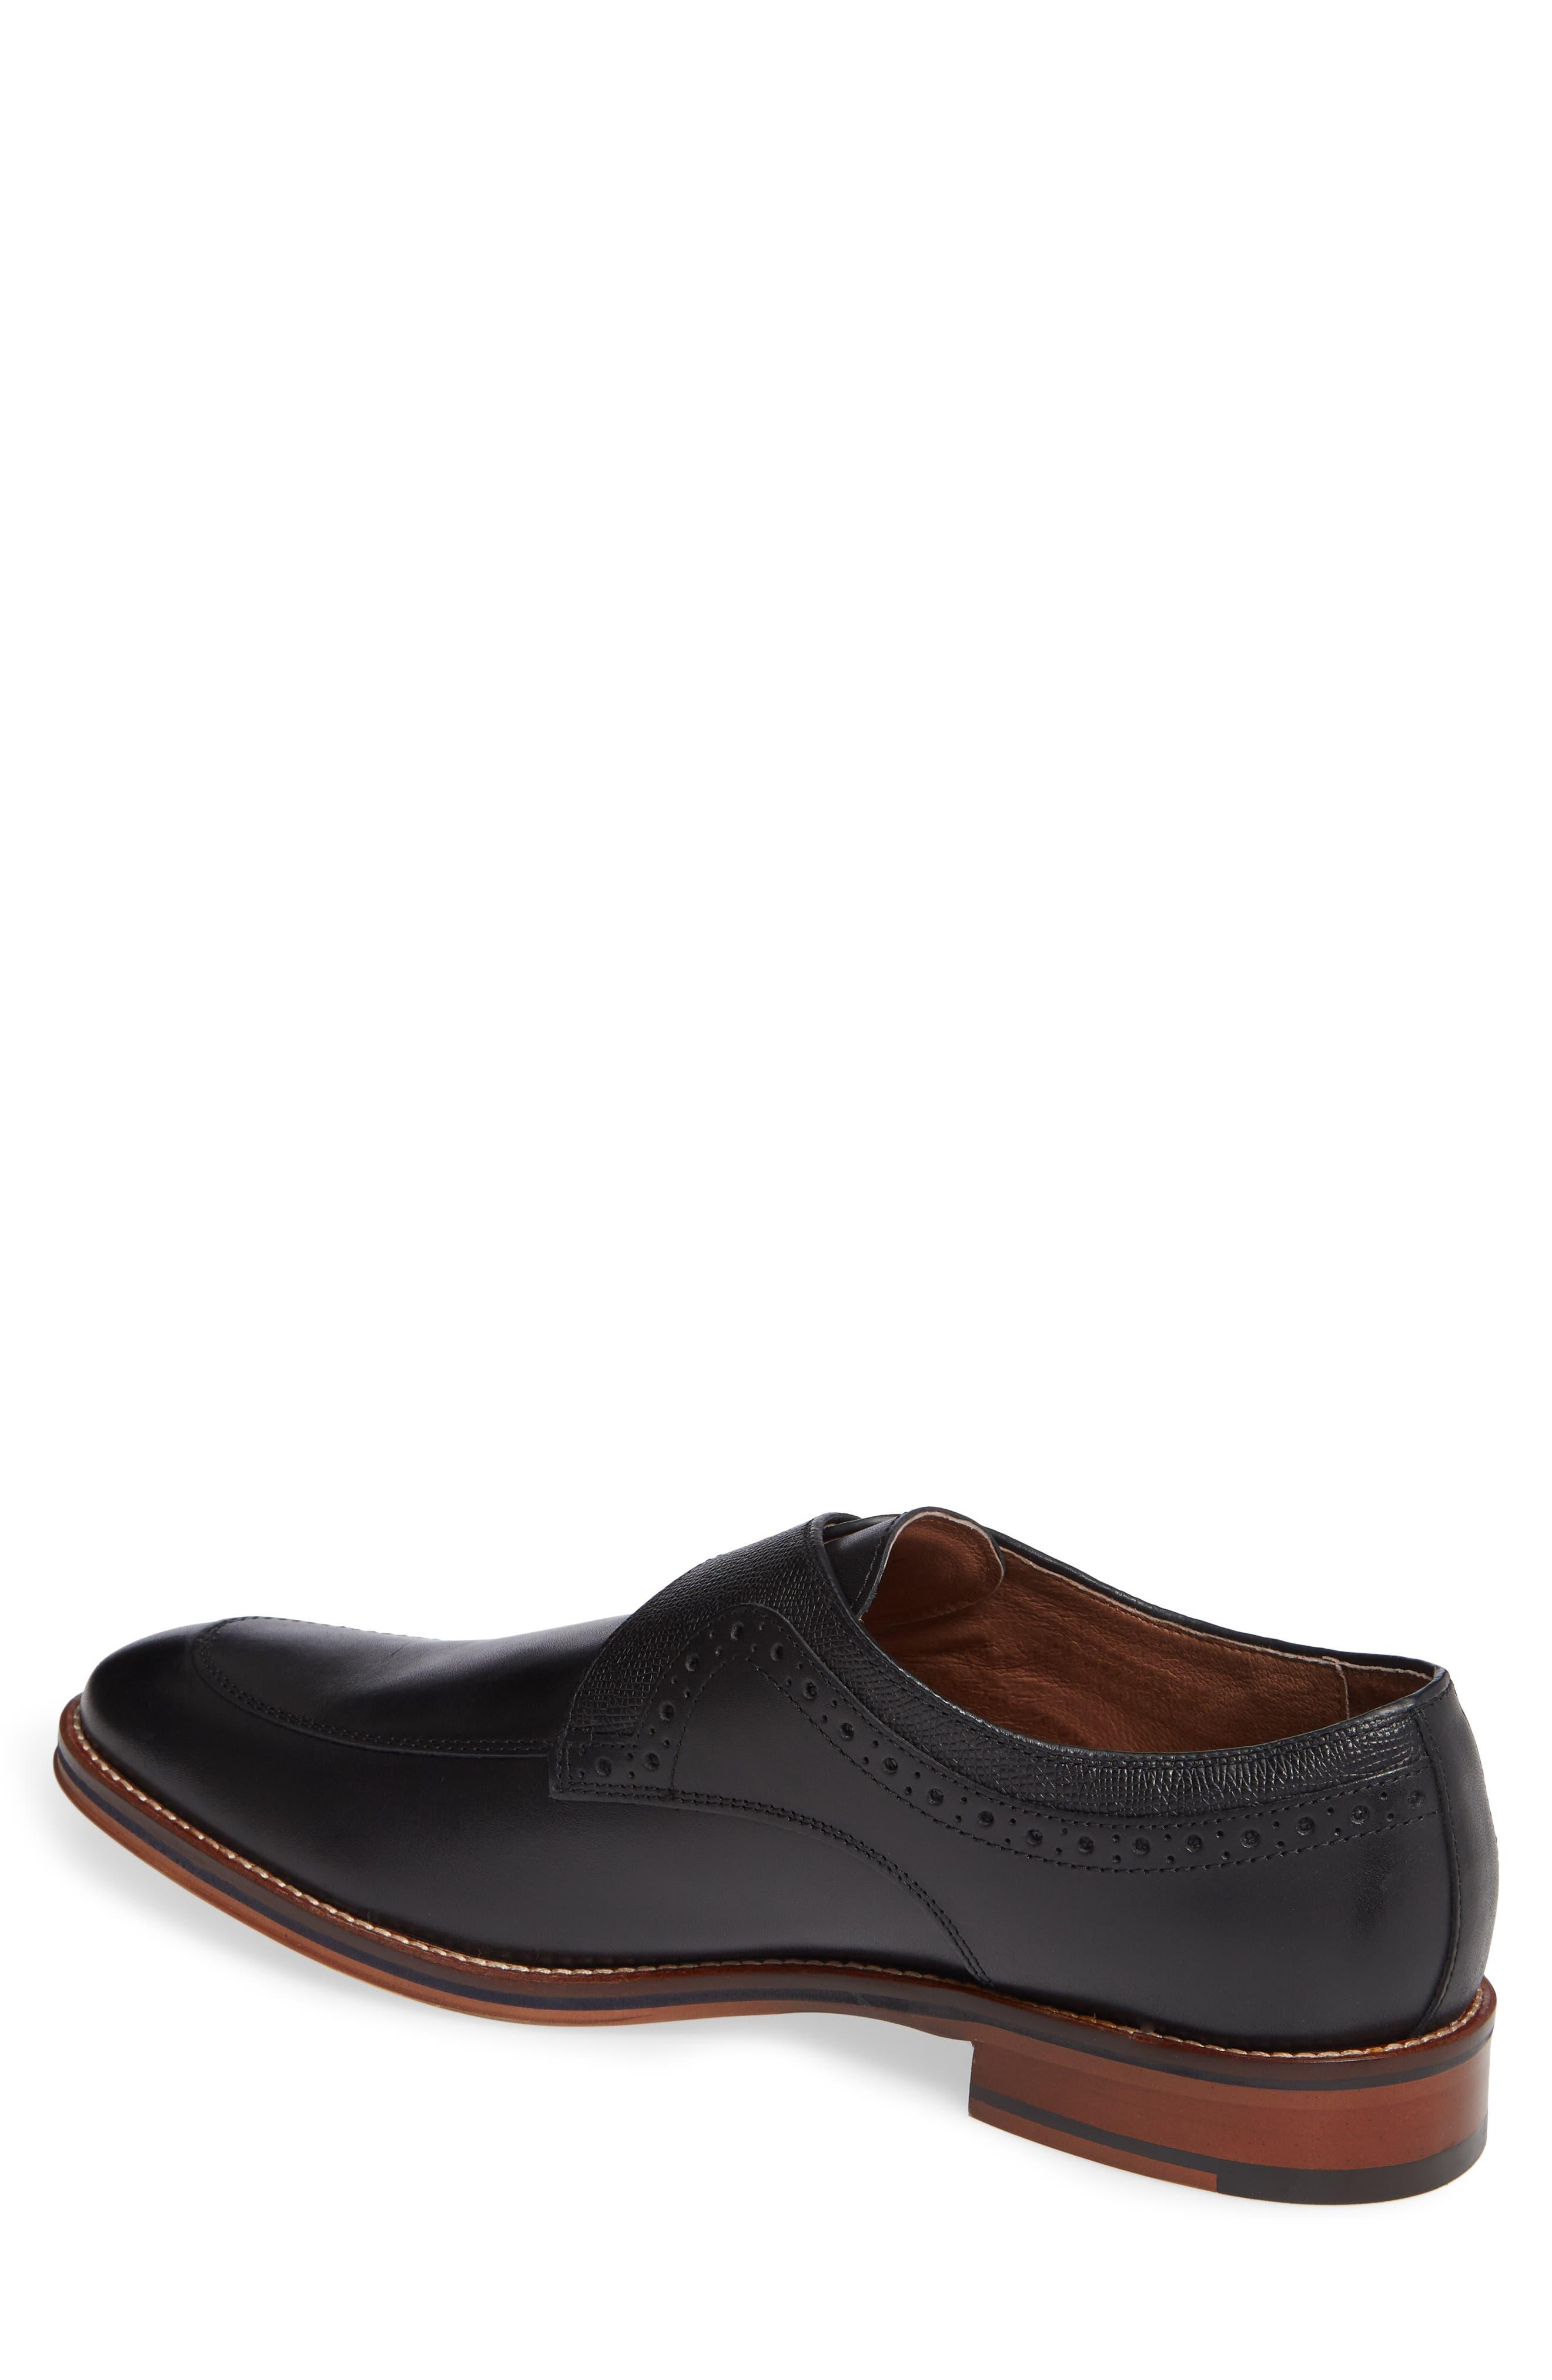 Conard Monk Strap Shoe,                             Alternate thumbnail 2, color,                             BLACK LEATHER